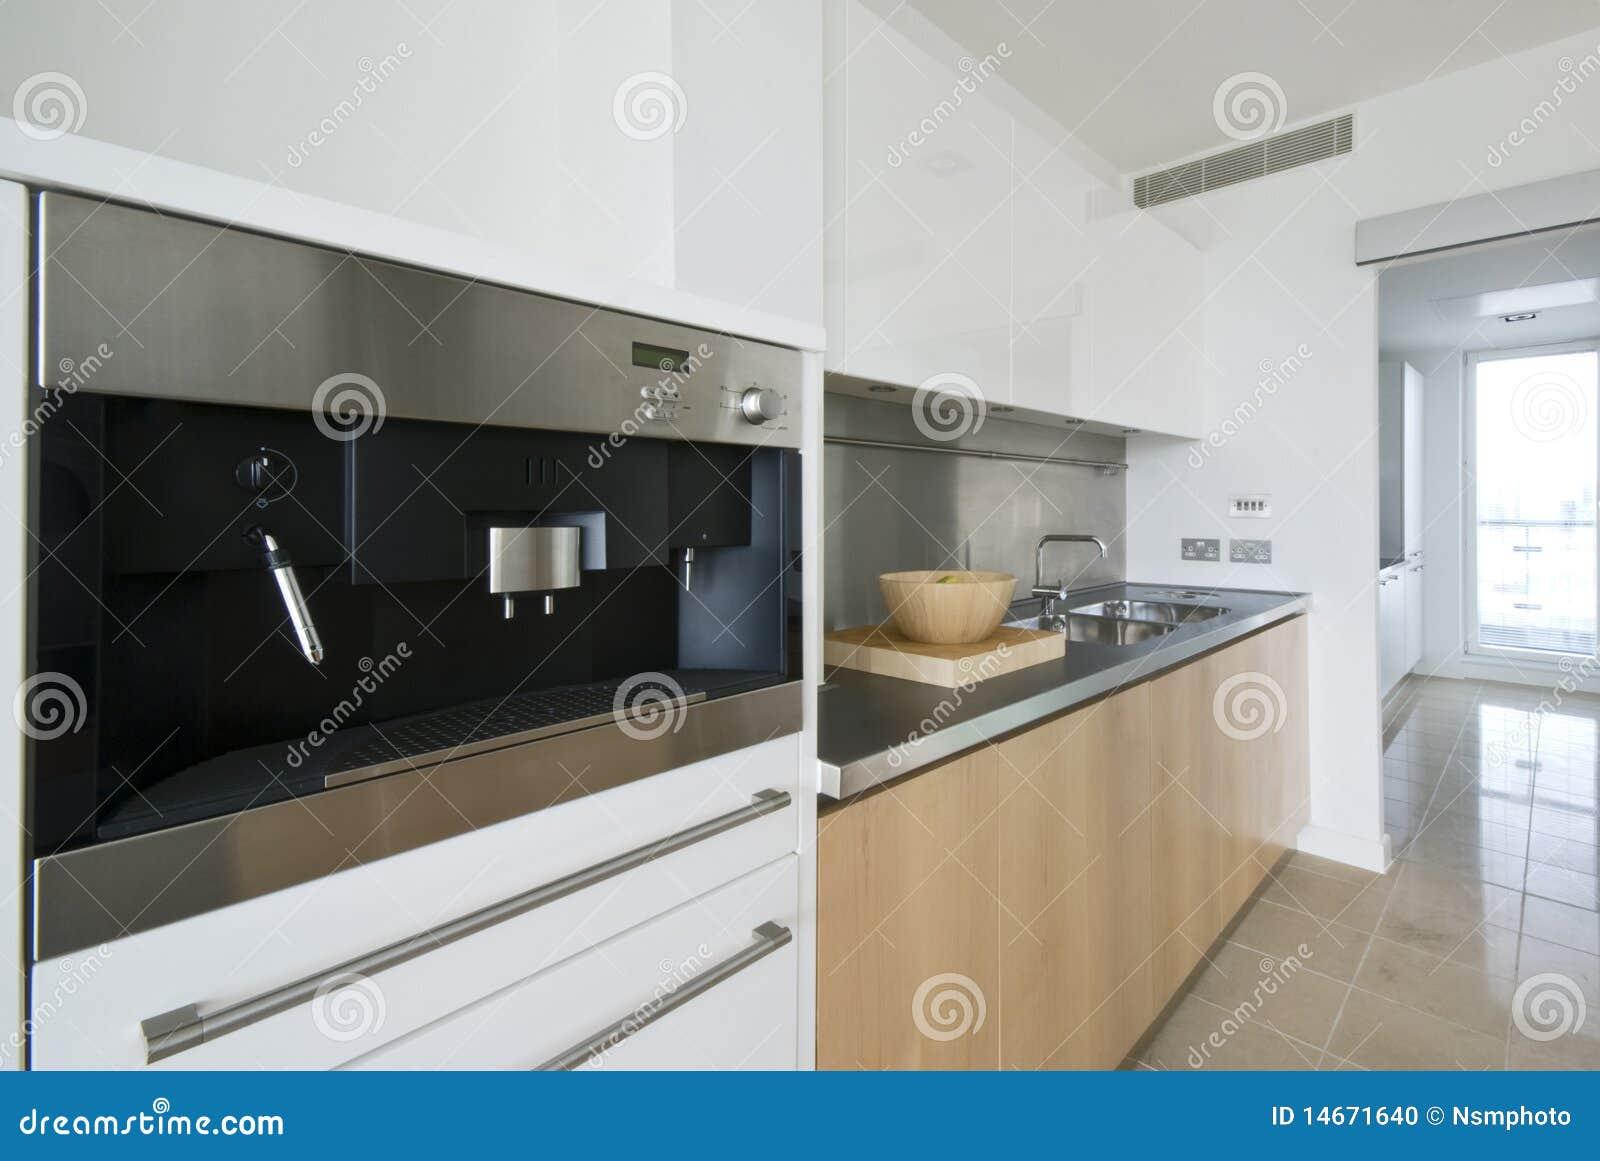 royaltyfree stock photo download kitchen with built in coffee machine